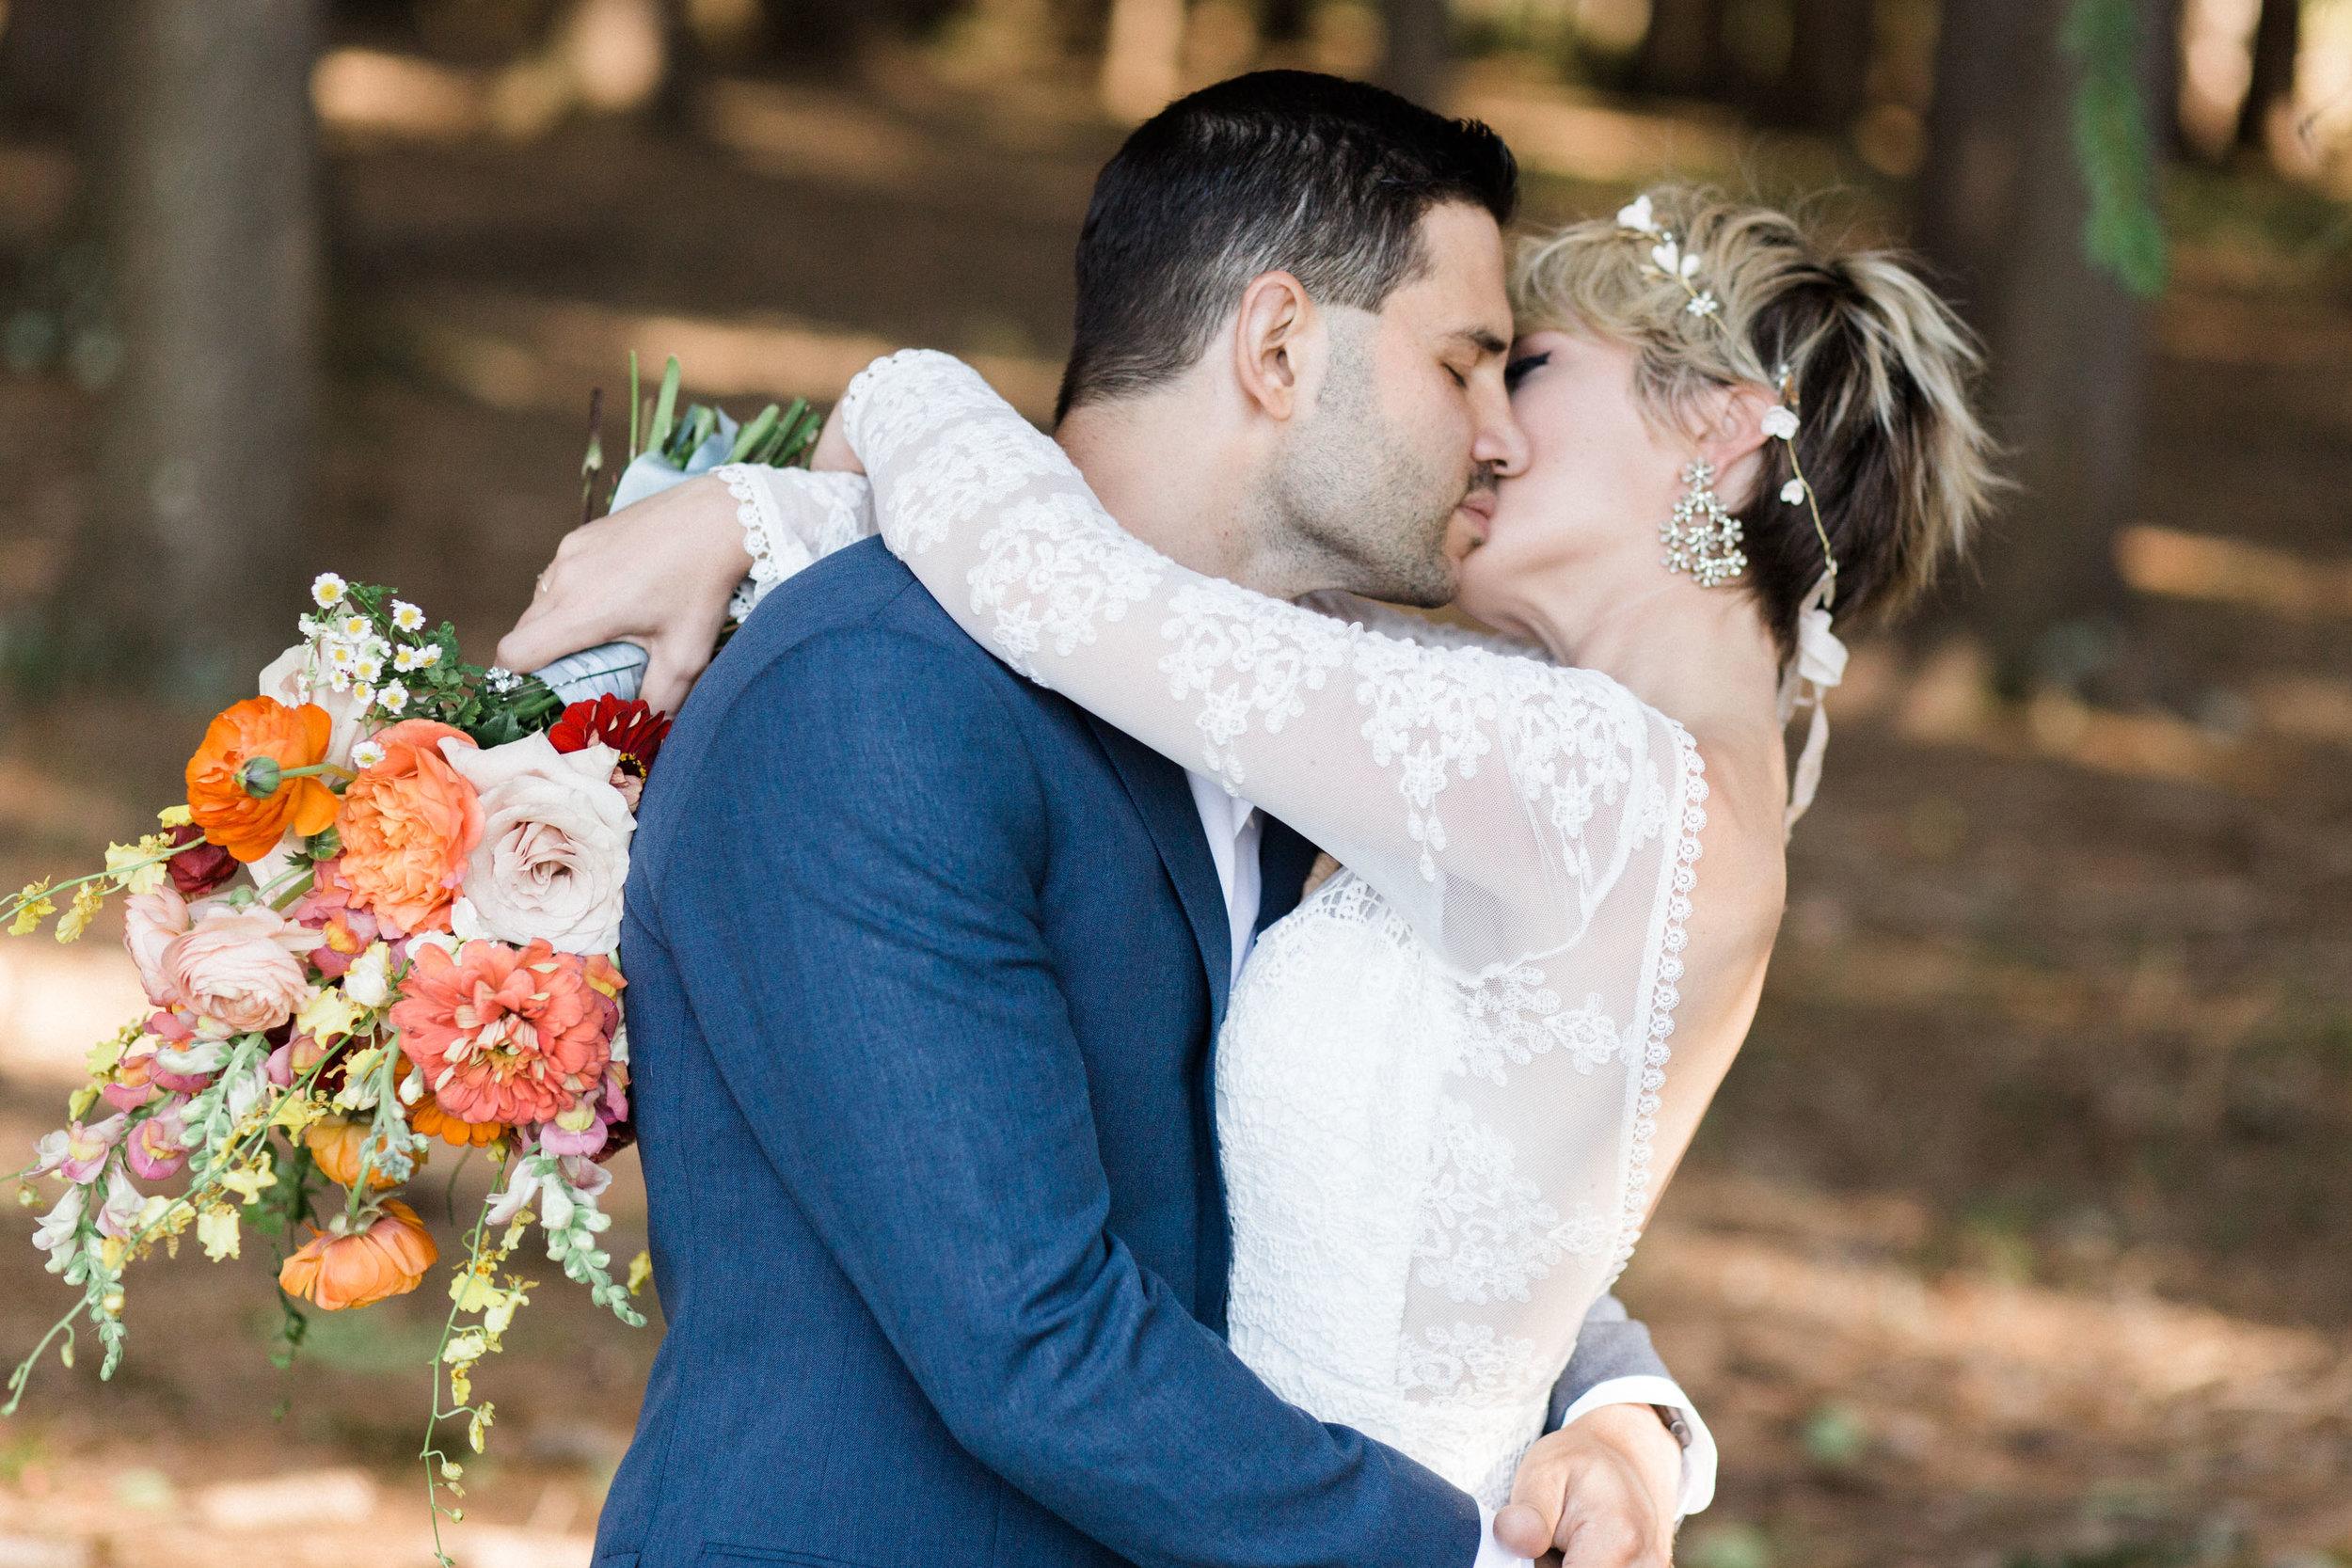 Josh & Hannah || A Fall Wedding in the Catskills